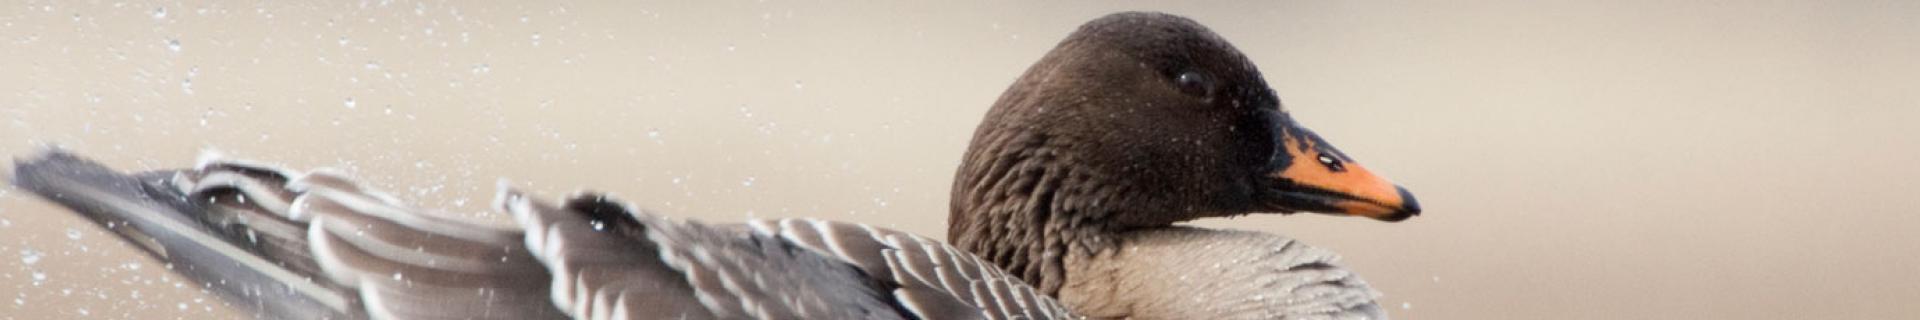 Taiga Bean Goose © Jari Peltomäki